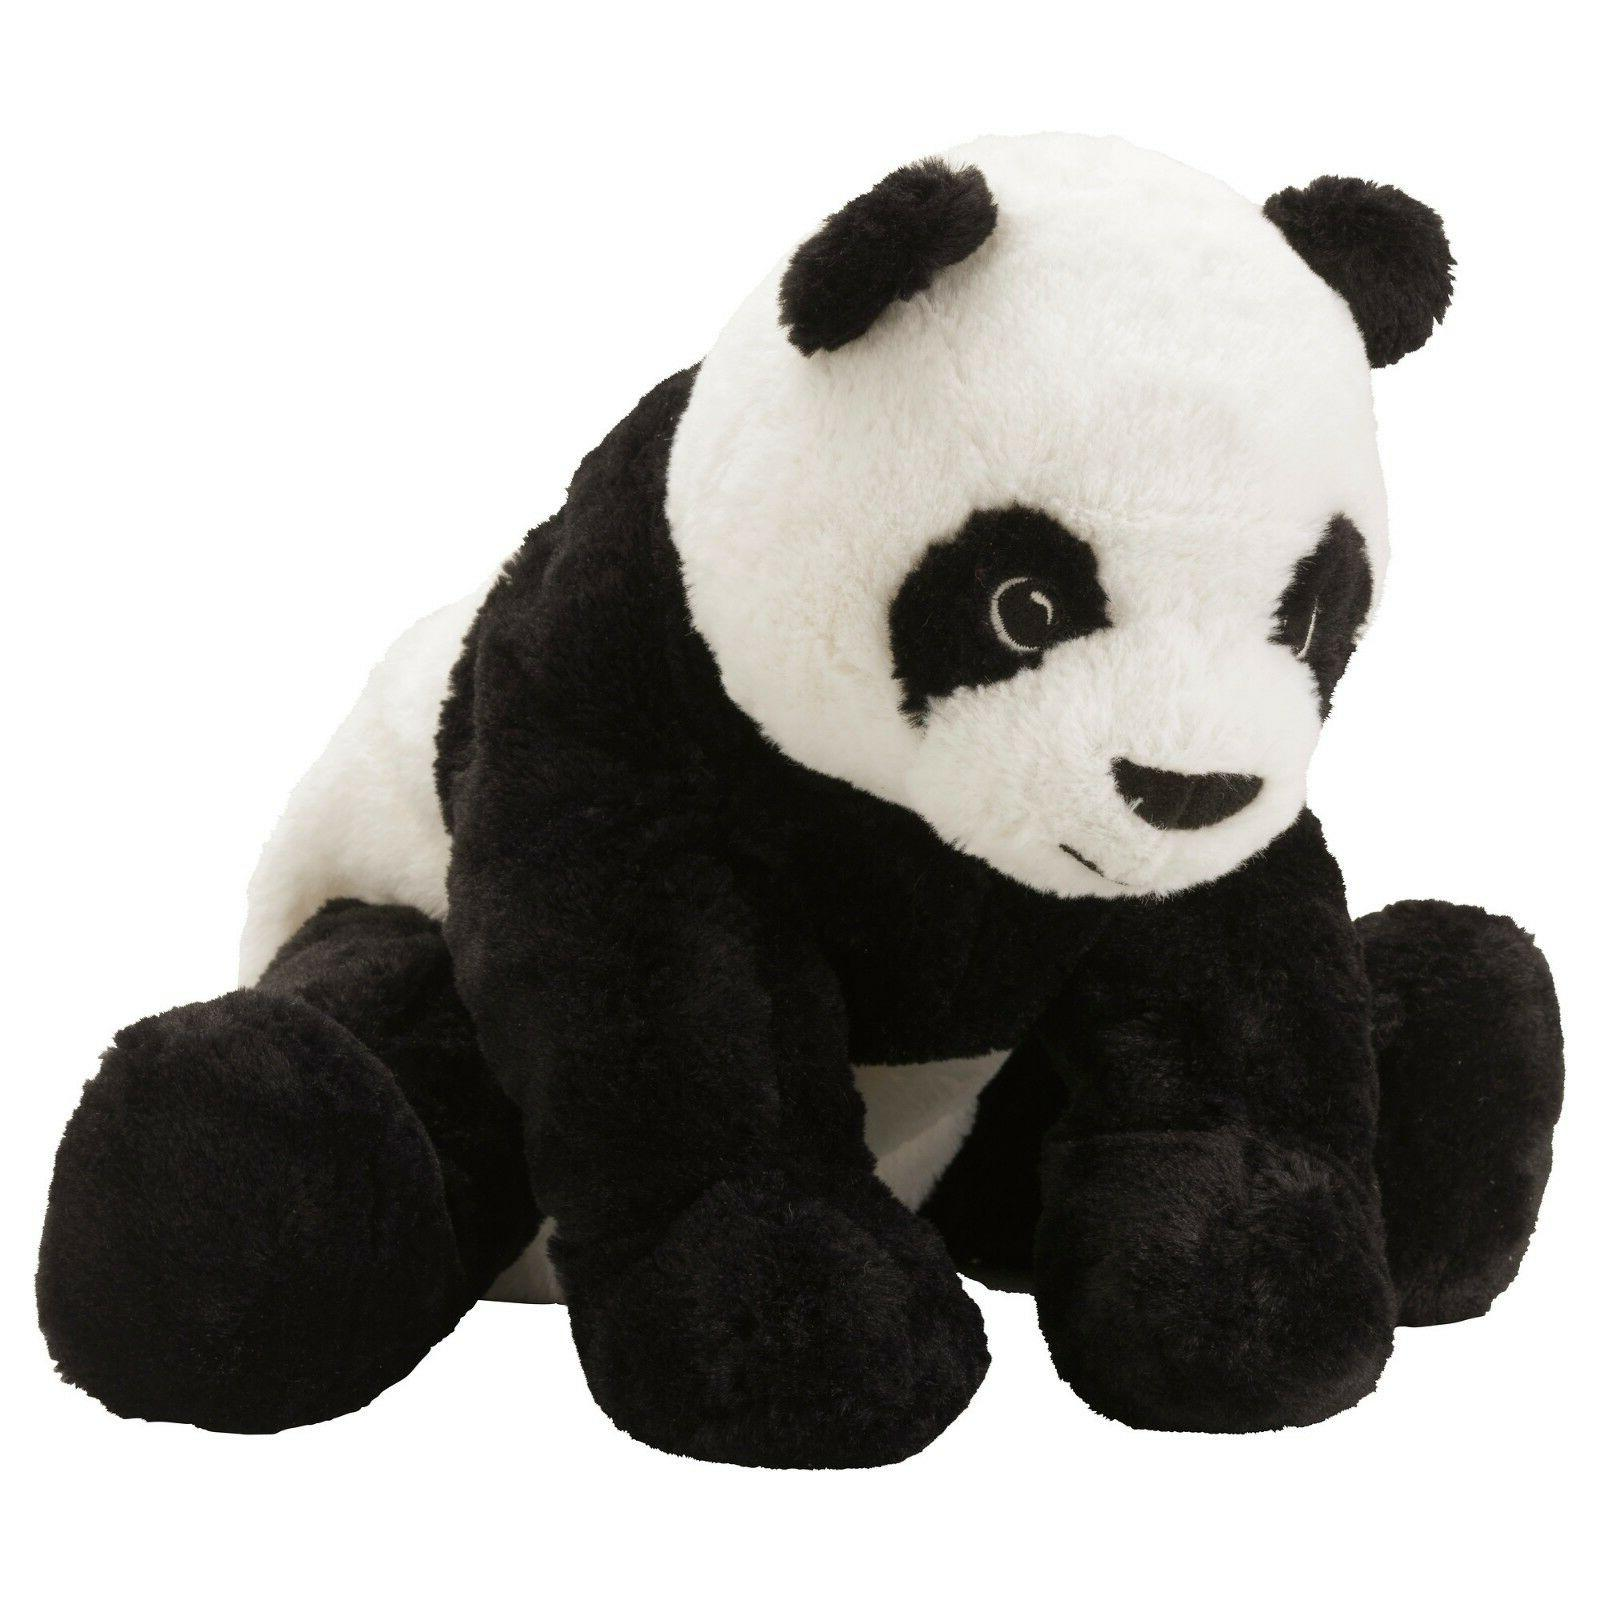 "IKEA Bear 12"" Stuffed Animal Kid Toy KRAMIG NEW GIFT idea"